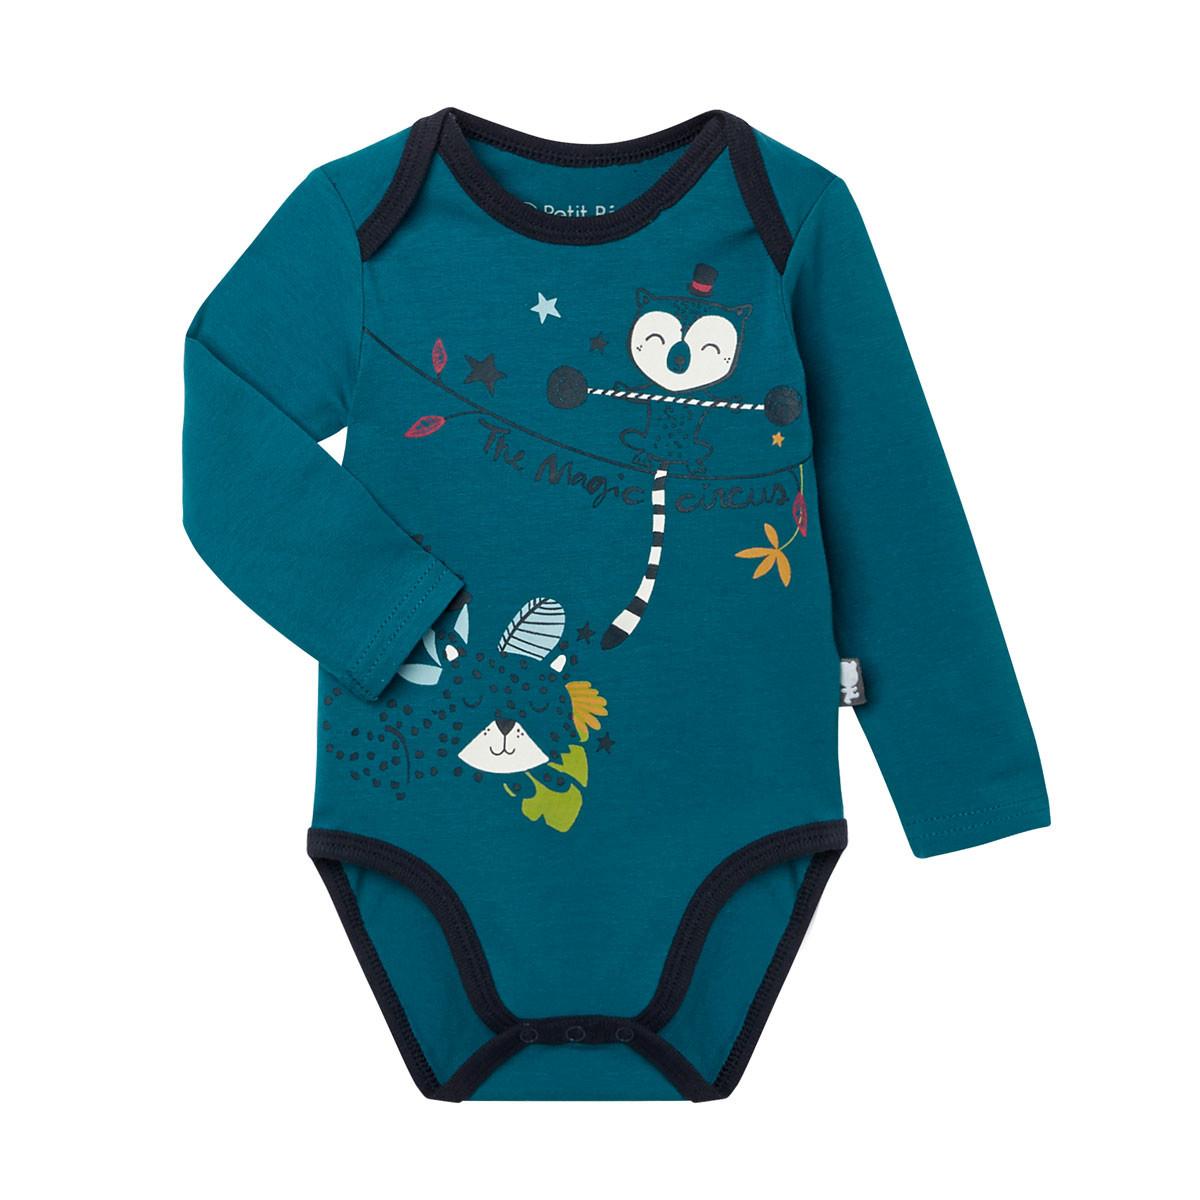 Lot de 2 bodies bébé garçon manches longues Jungle Jungle bleu canard